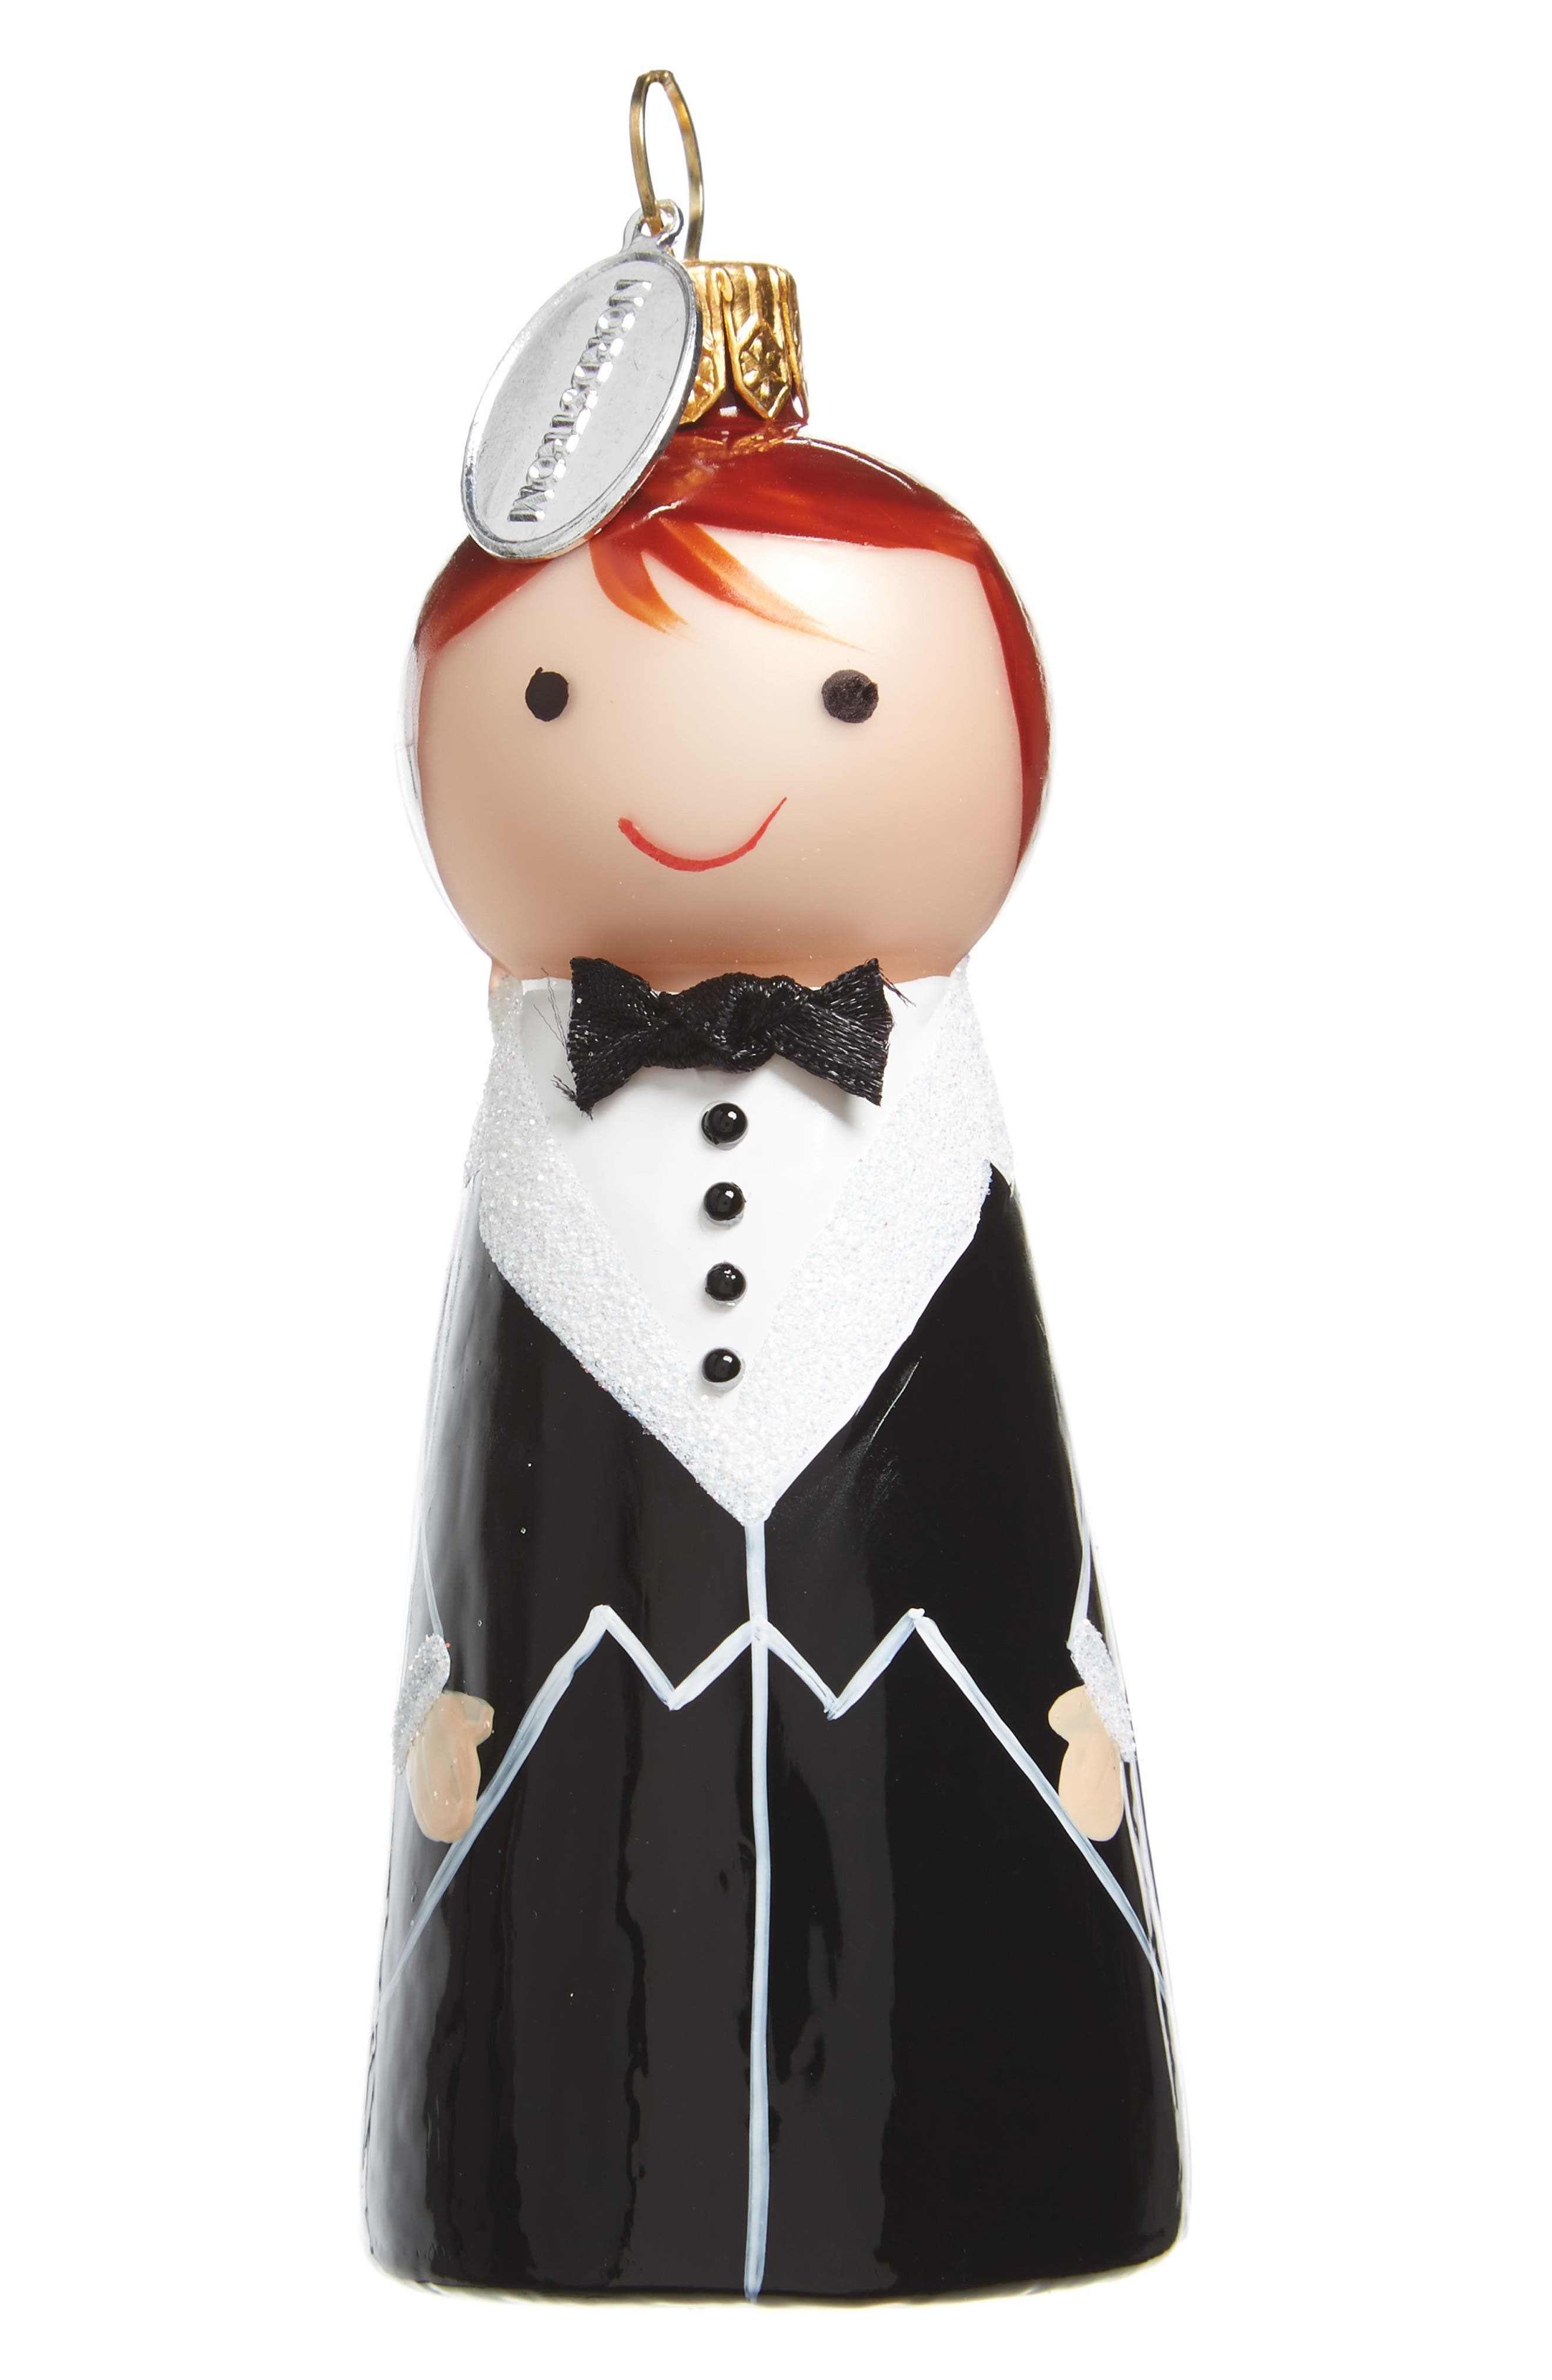 Nordstrom Glass Wedding Ornament